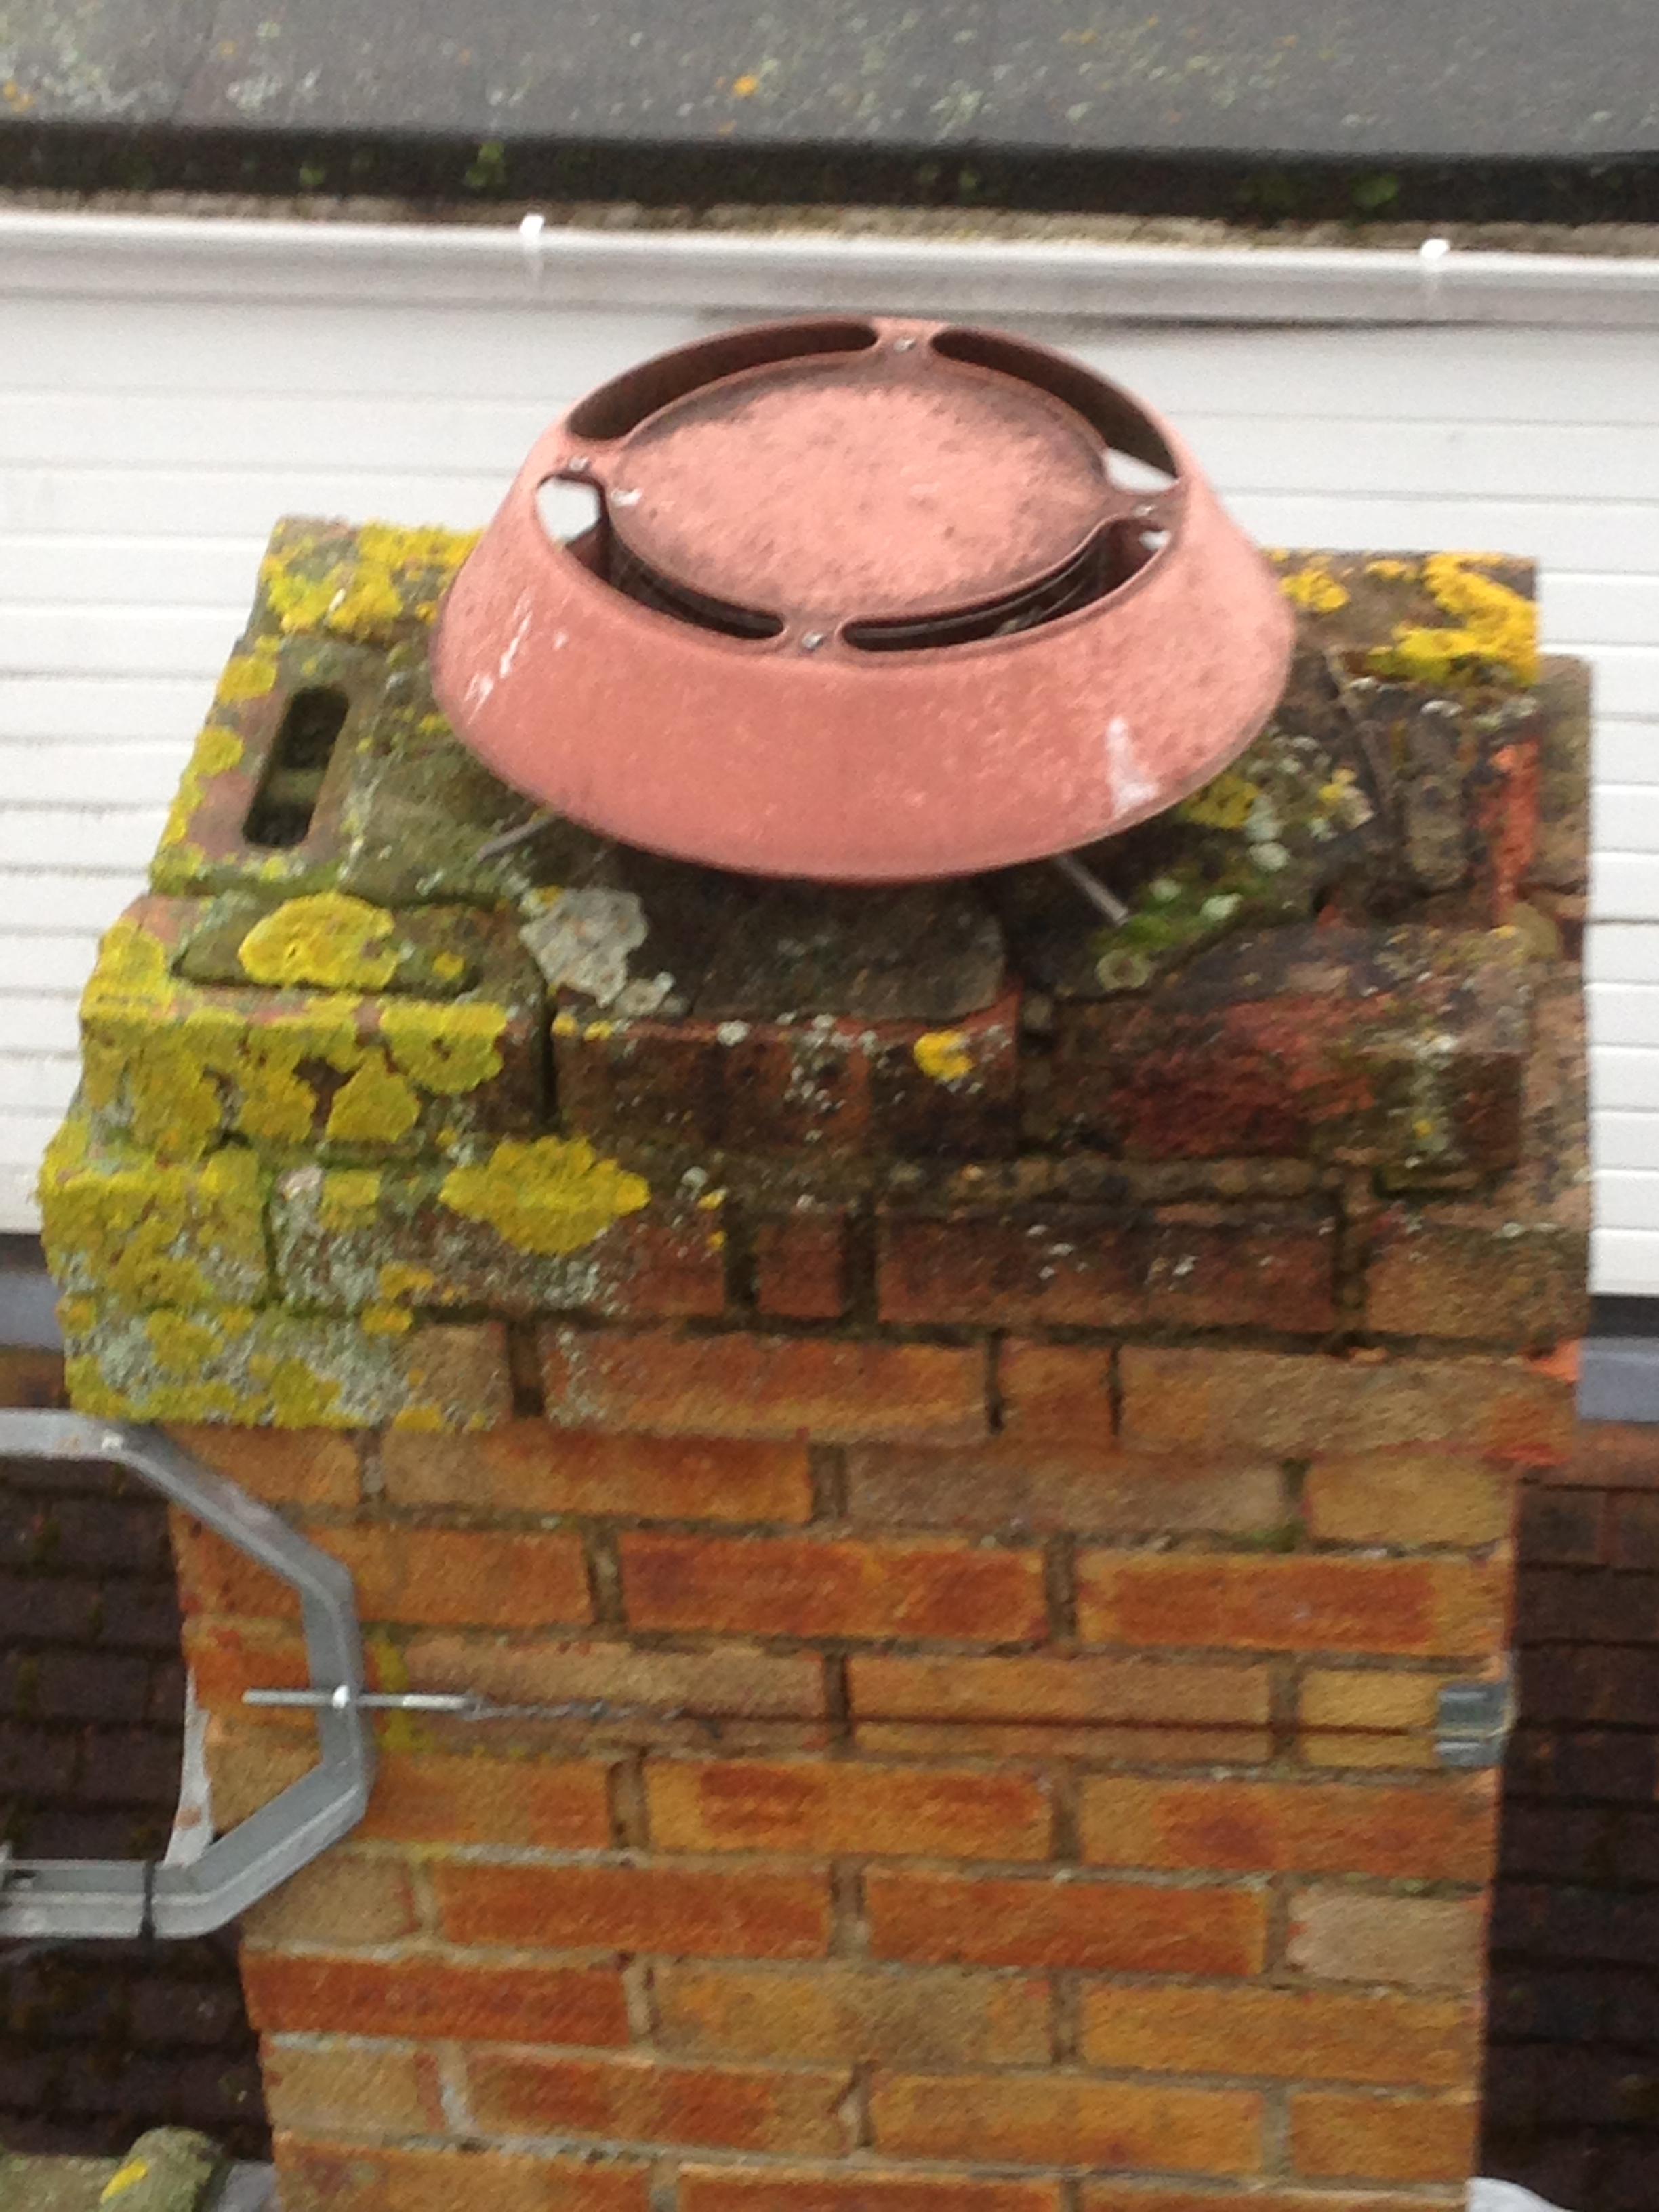 Chimney Stack Amp Chimney Pot Repairs